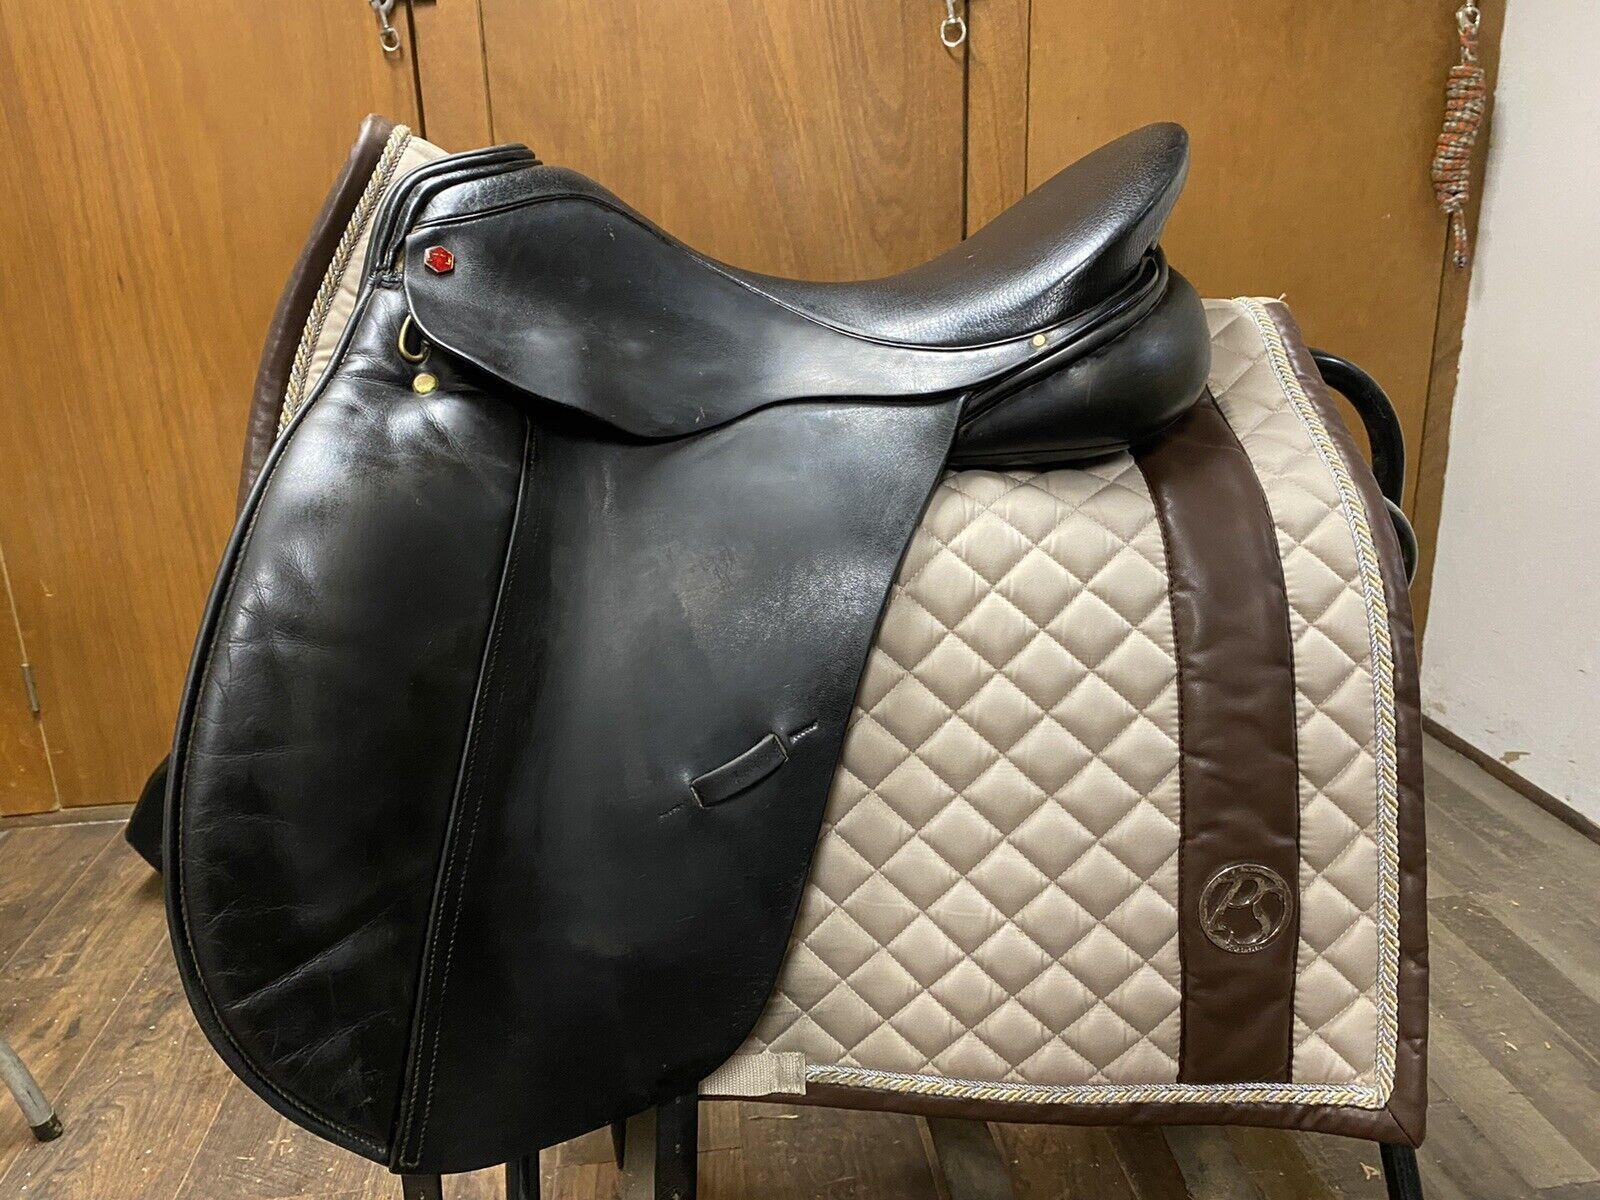 Albion SL Dressage Saddle 17.5